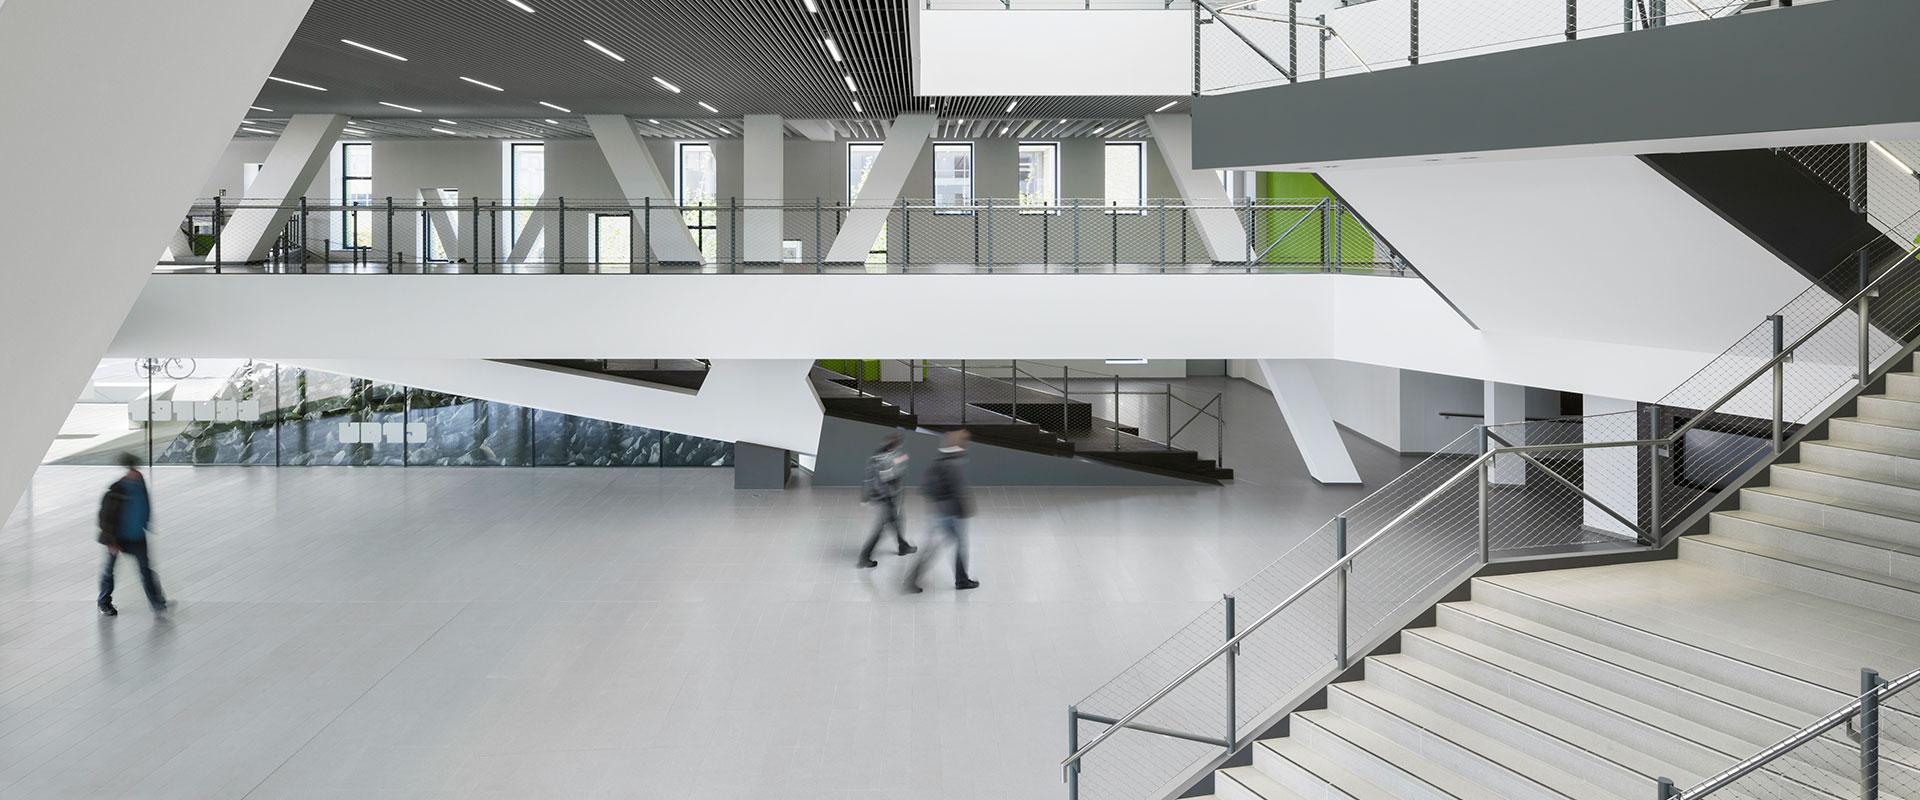 AGGLOTECH-progetto-hochschule-slider-1